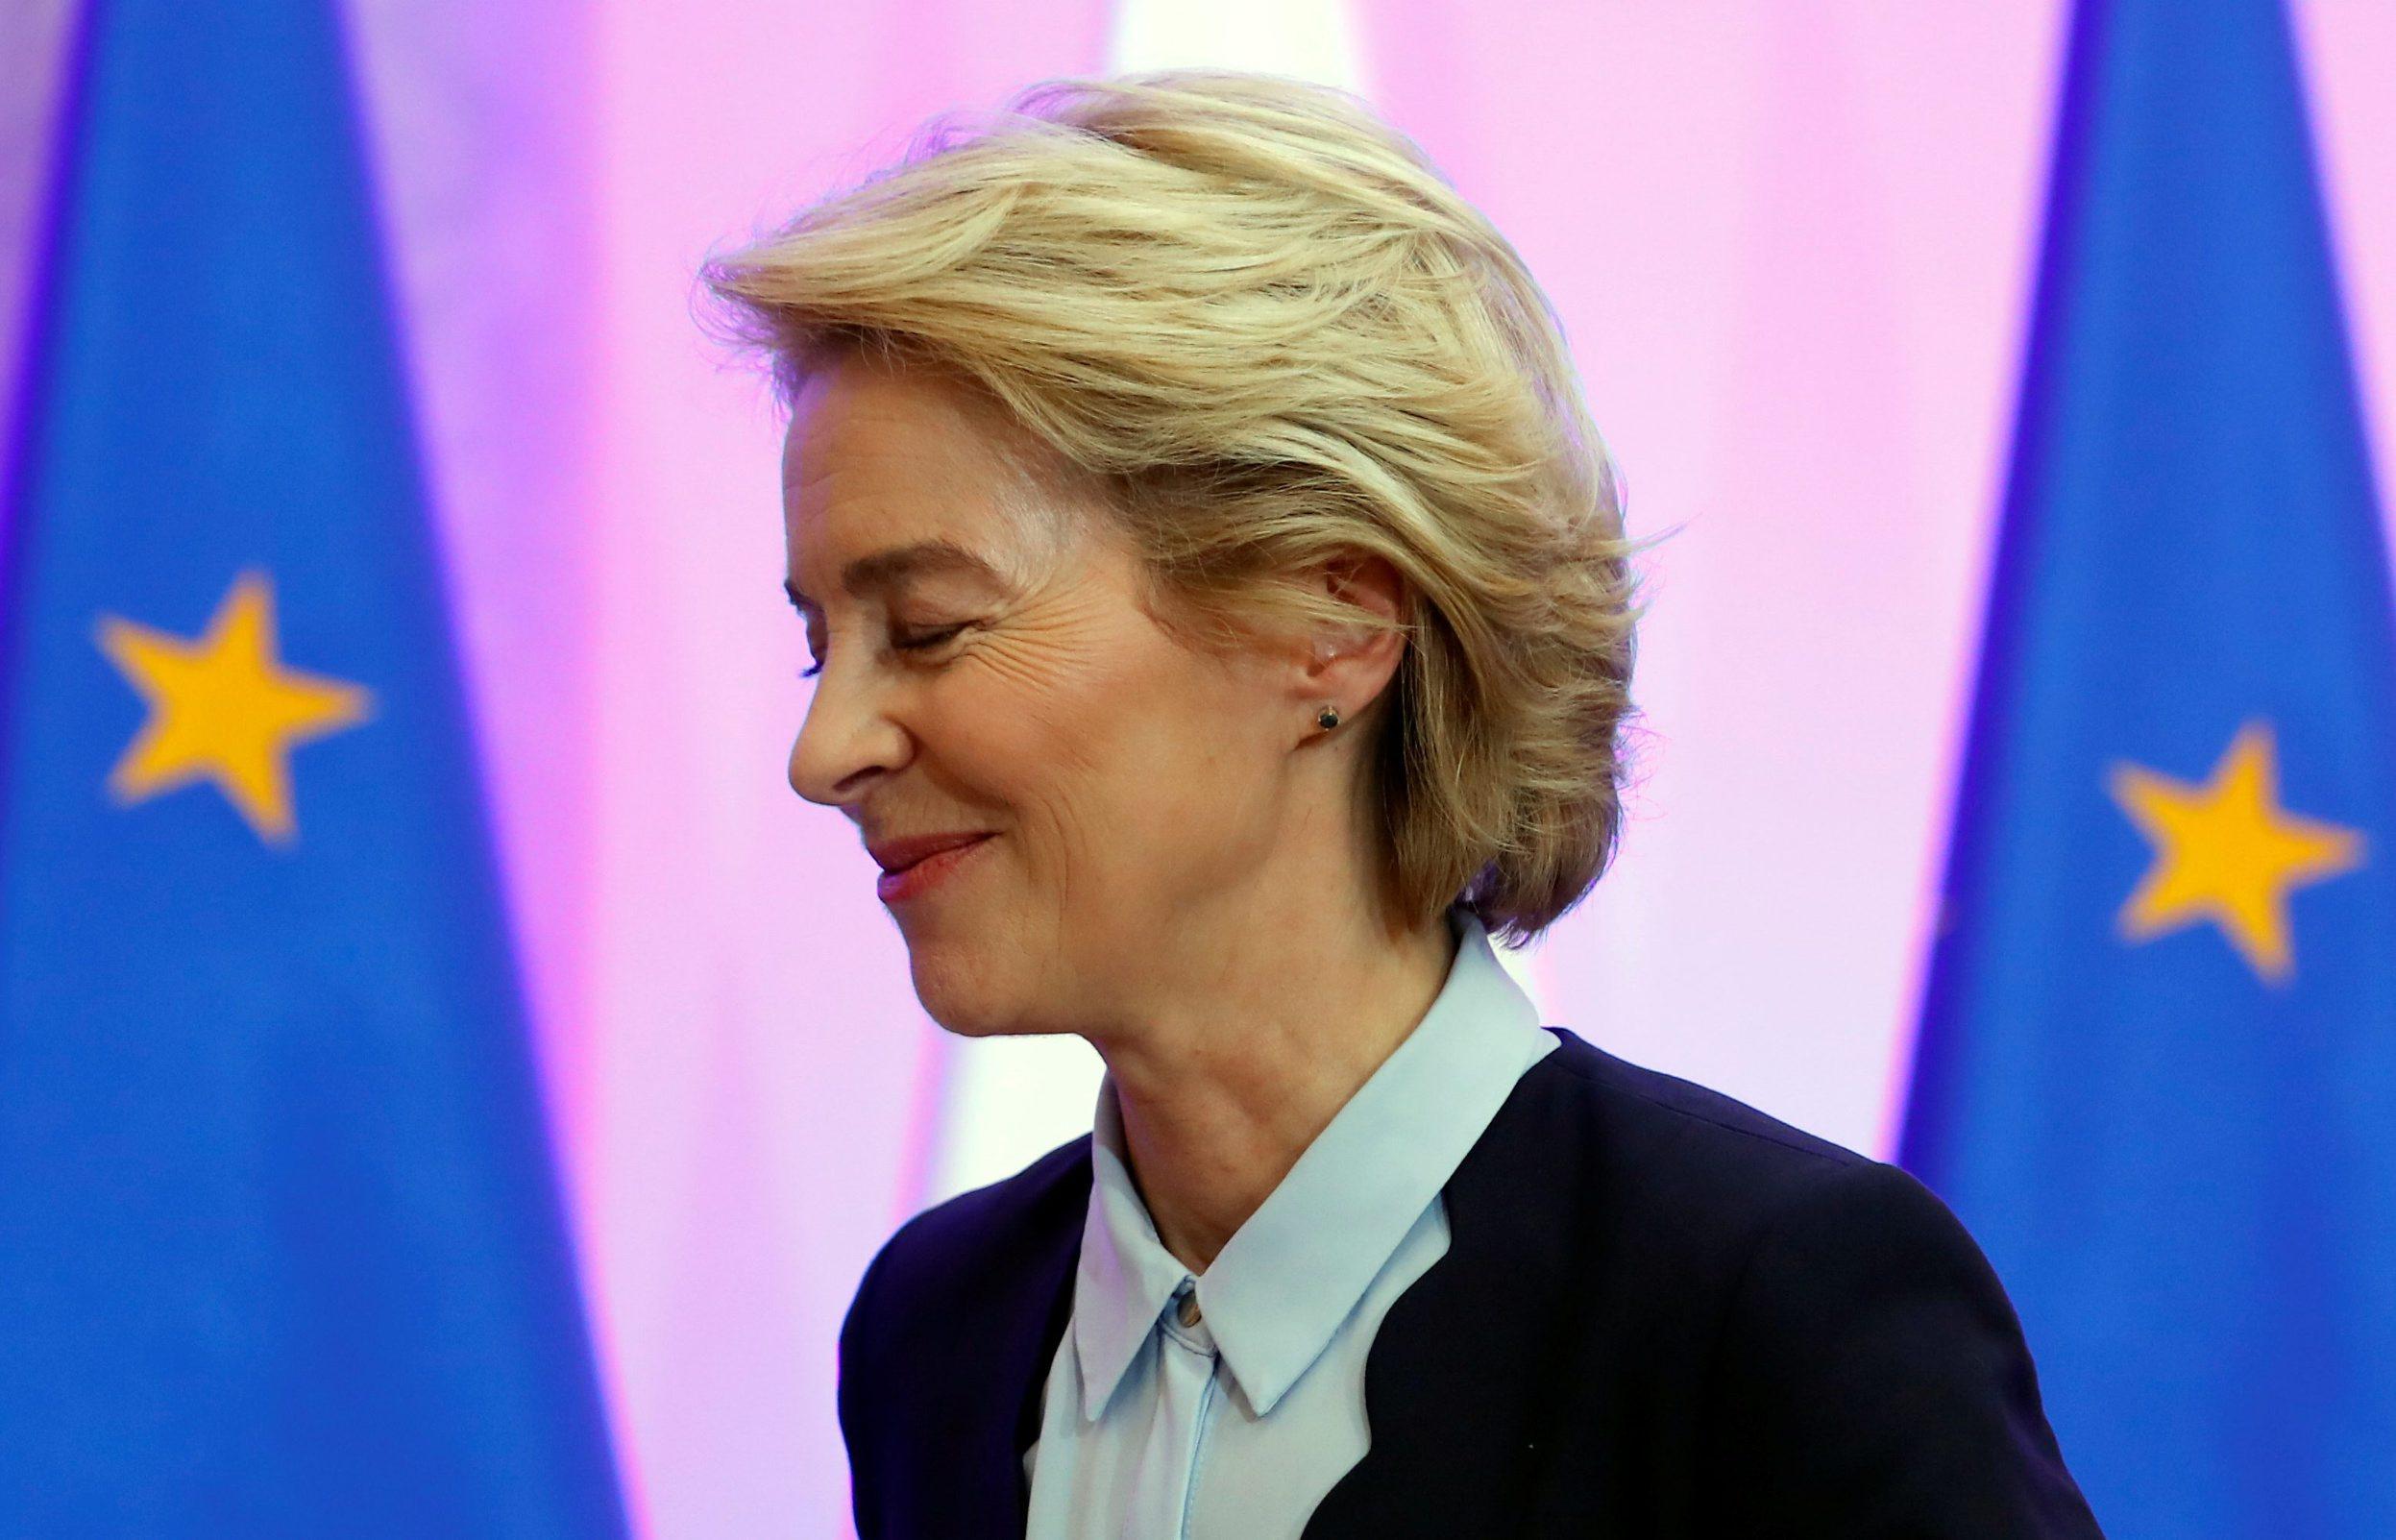 Novoizabrana predsjednica Europske komisije Ursula von der Leyen